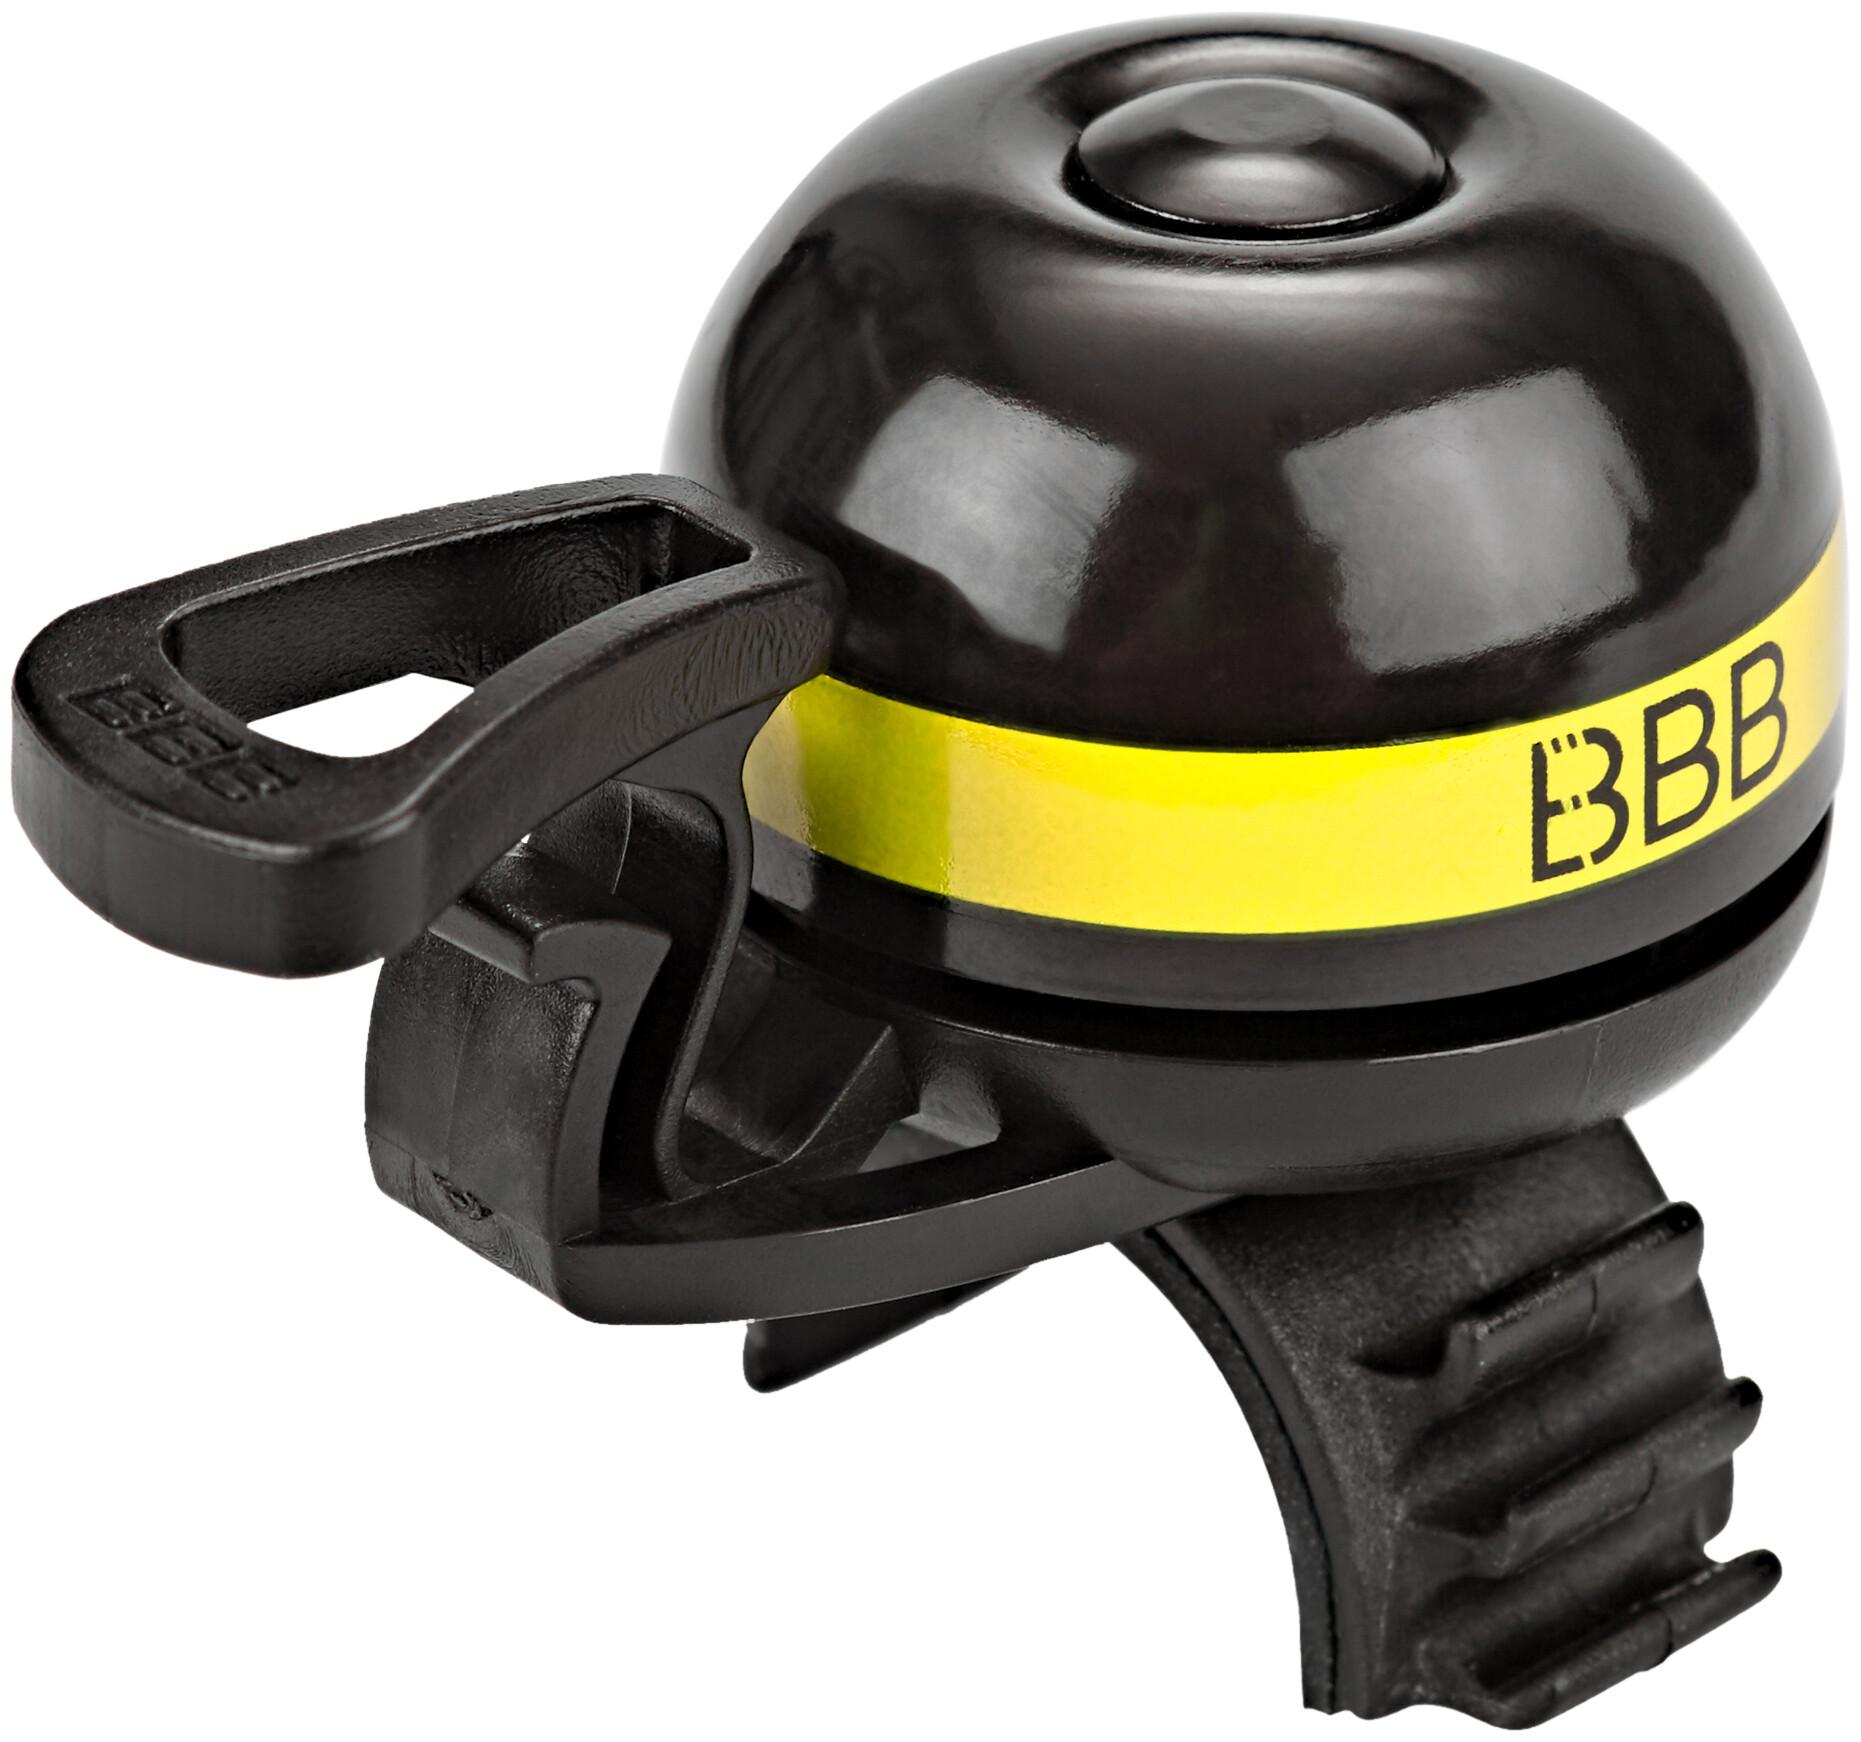 BBB EasyFit Deluxe BBB-14 Ringeklokke, yellow (2019)   Bells